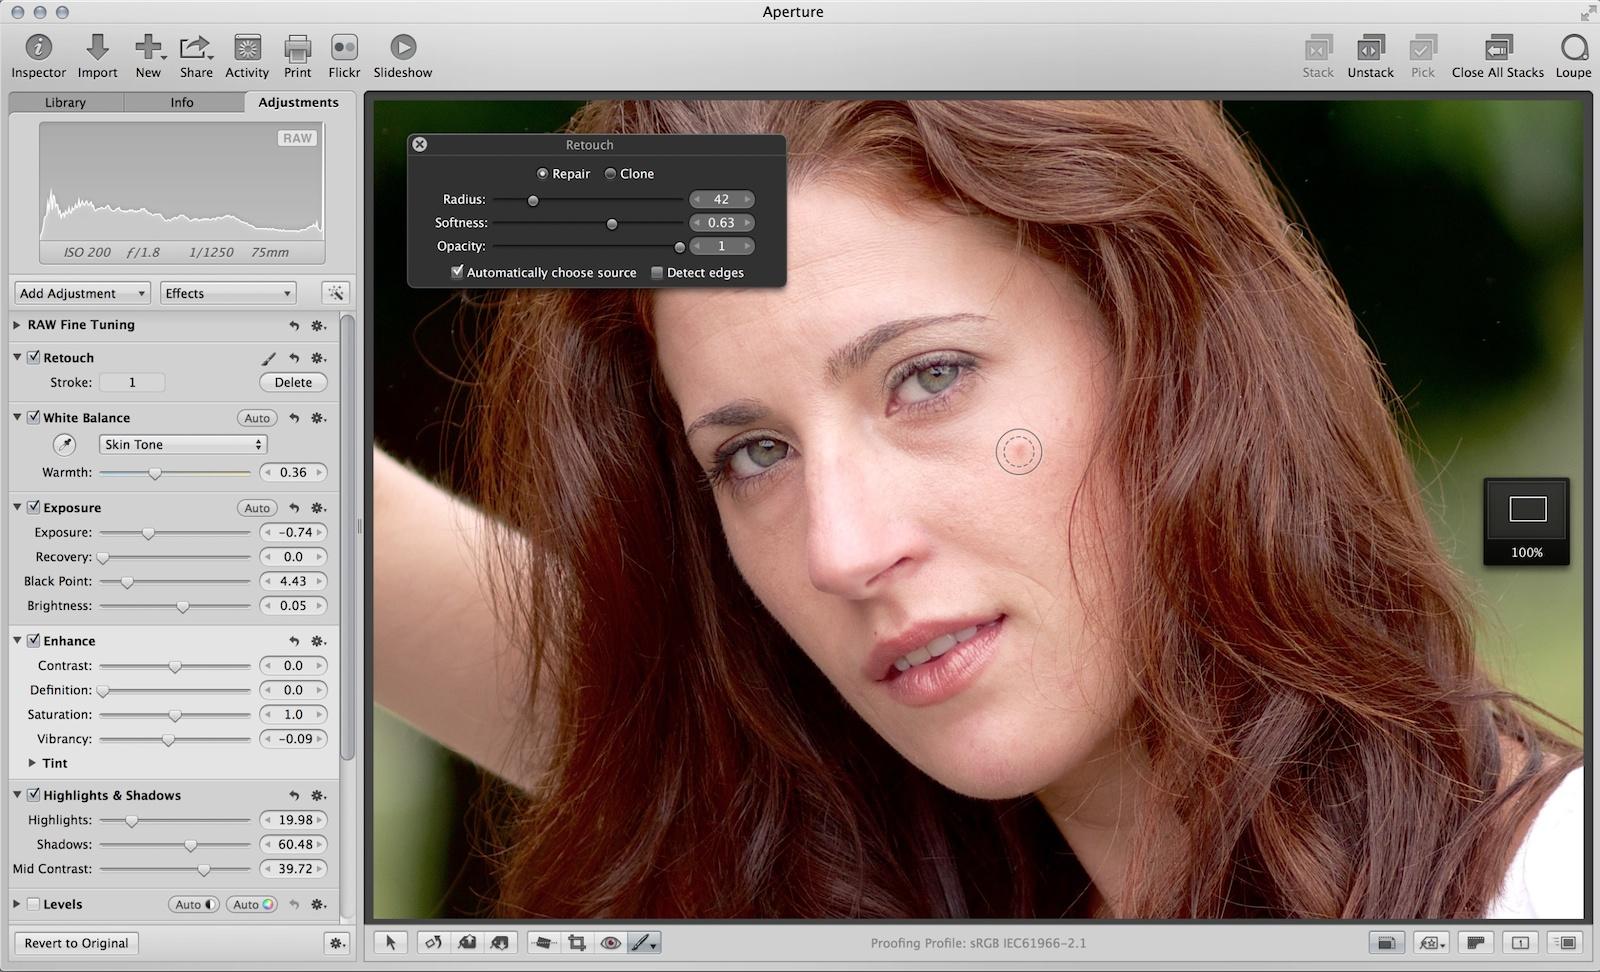 http://thedigitalstory.com/2014/01/10/aperture-portrait-retouch.jpg